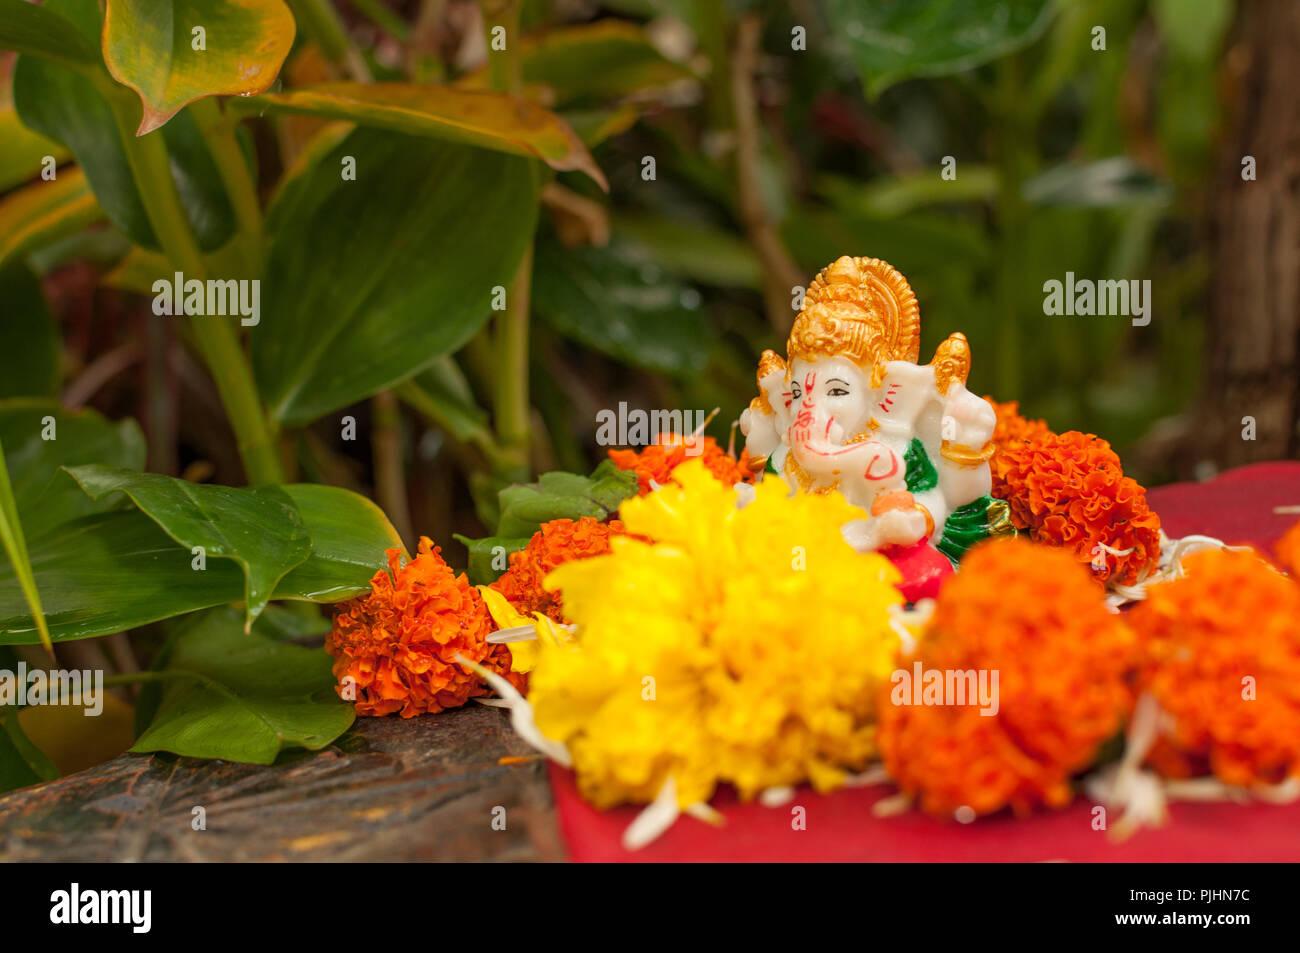 Ganpati Stock Photos & Ganpati Stock Images - Alamy